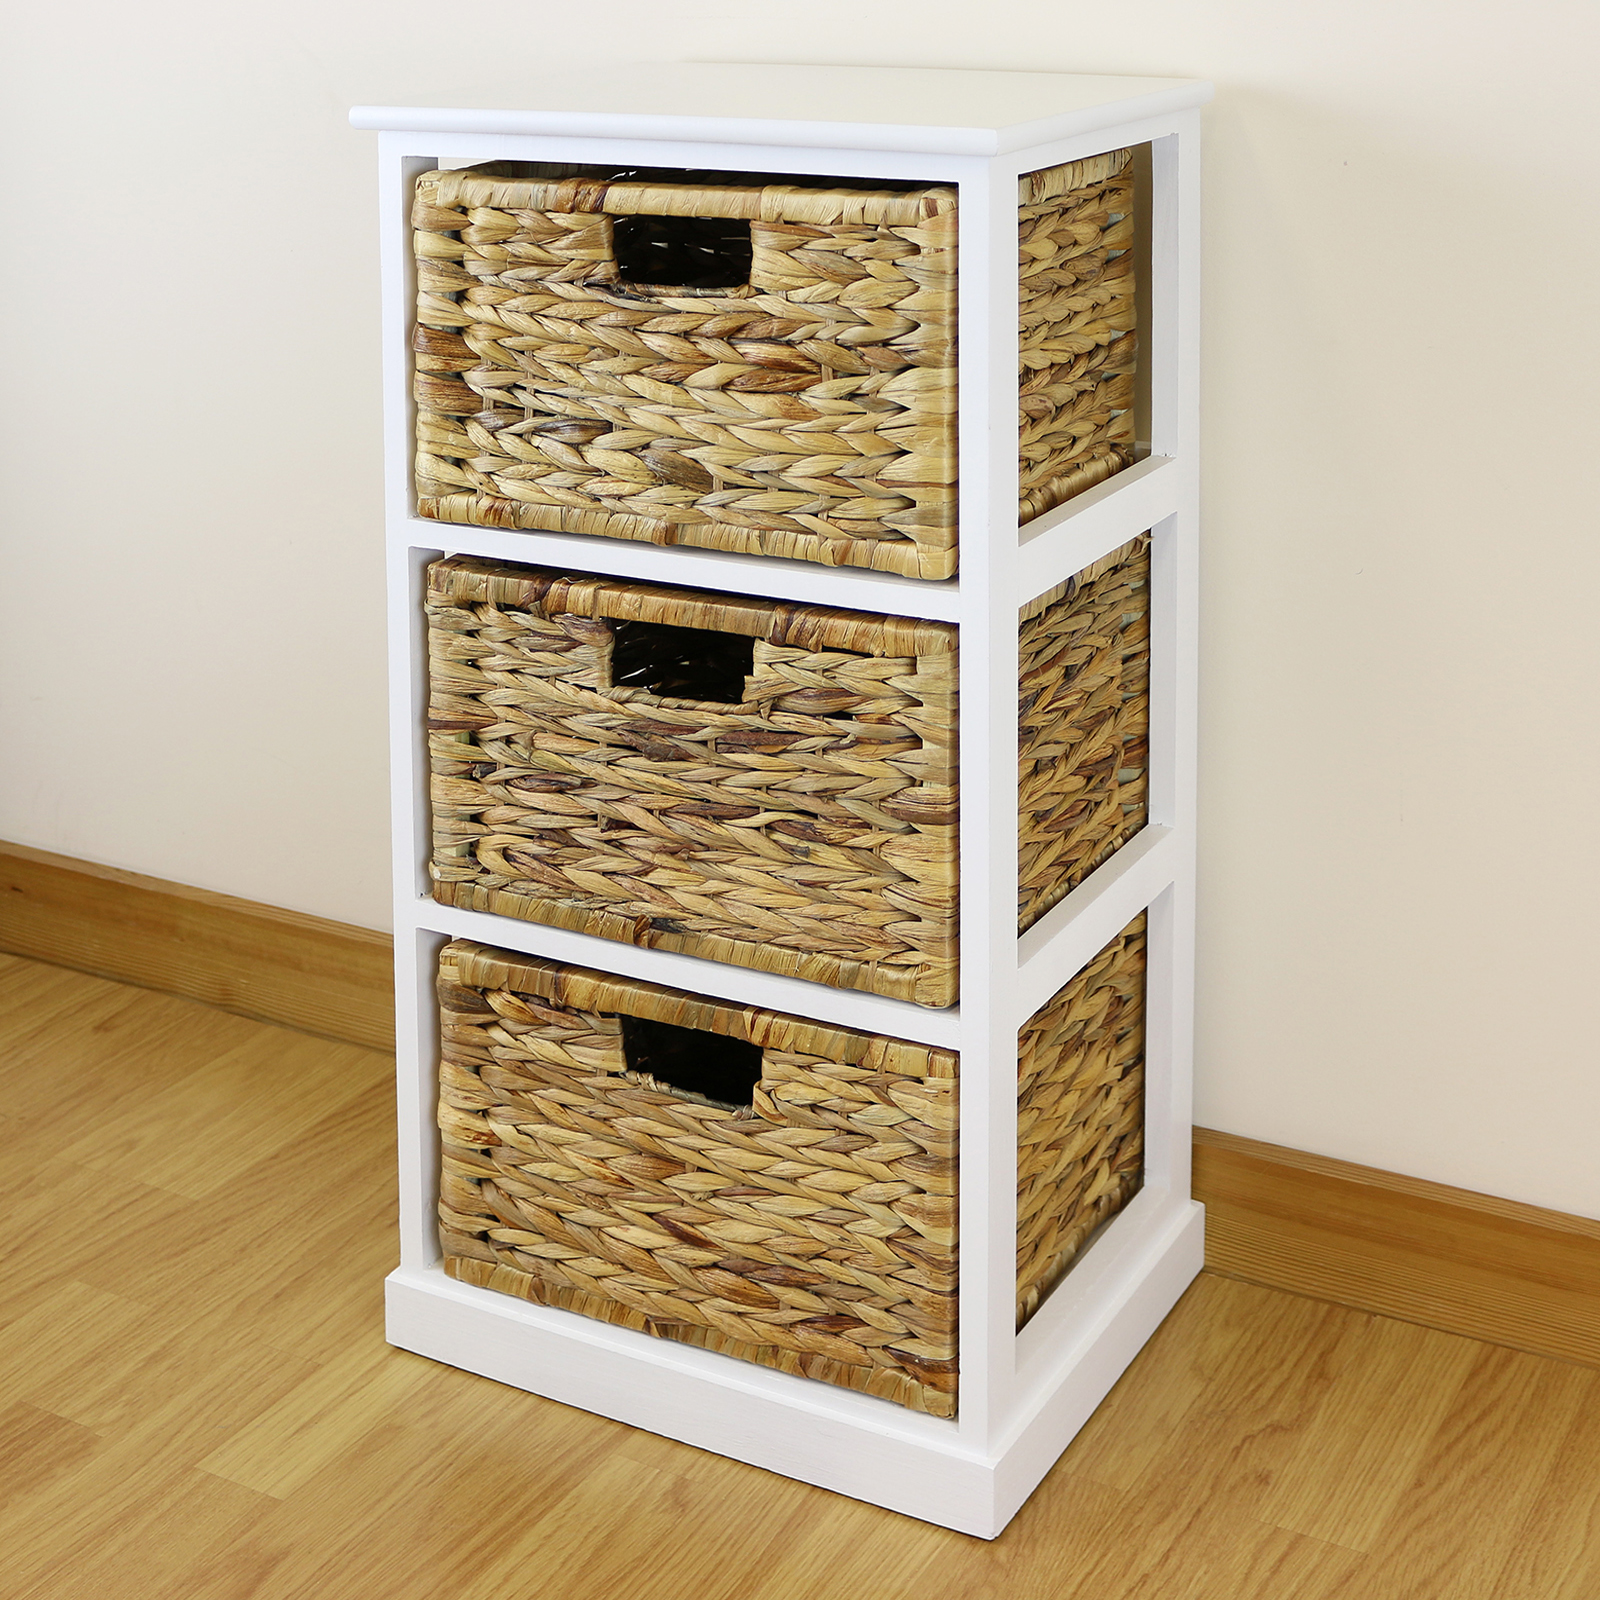 3 Basket Drawer Bathroom Storage Unit Cabinet White white 3 drawer basket bedside cabinet/home storage unit/lounge